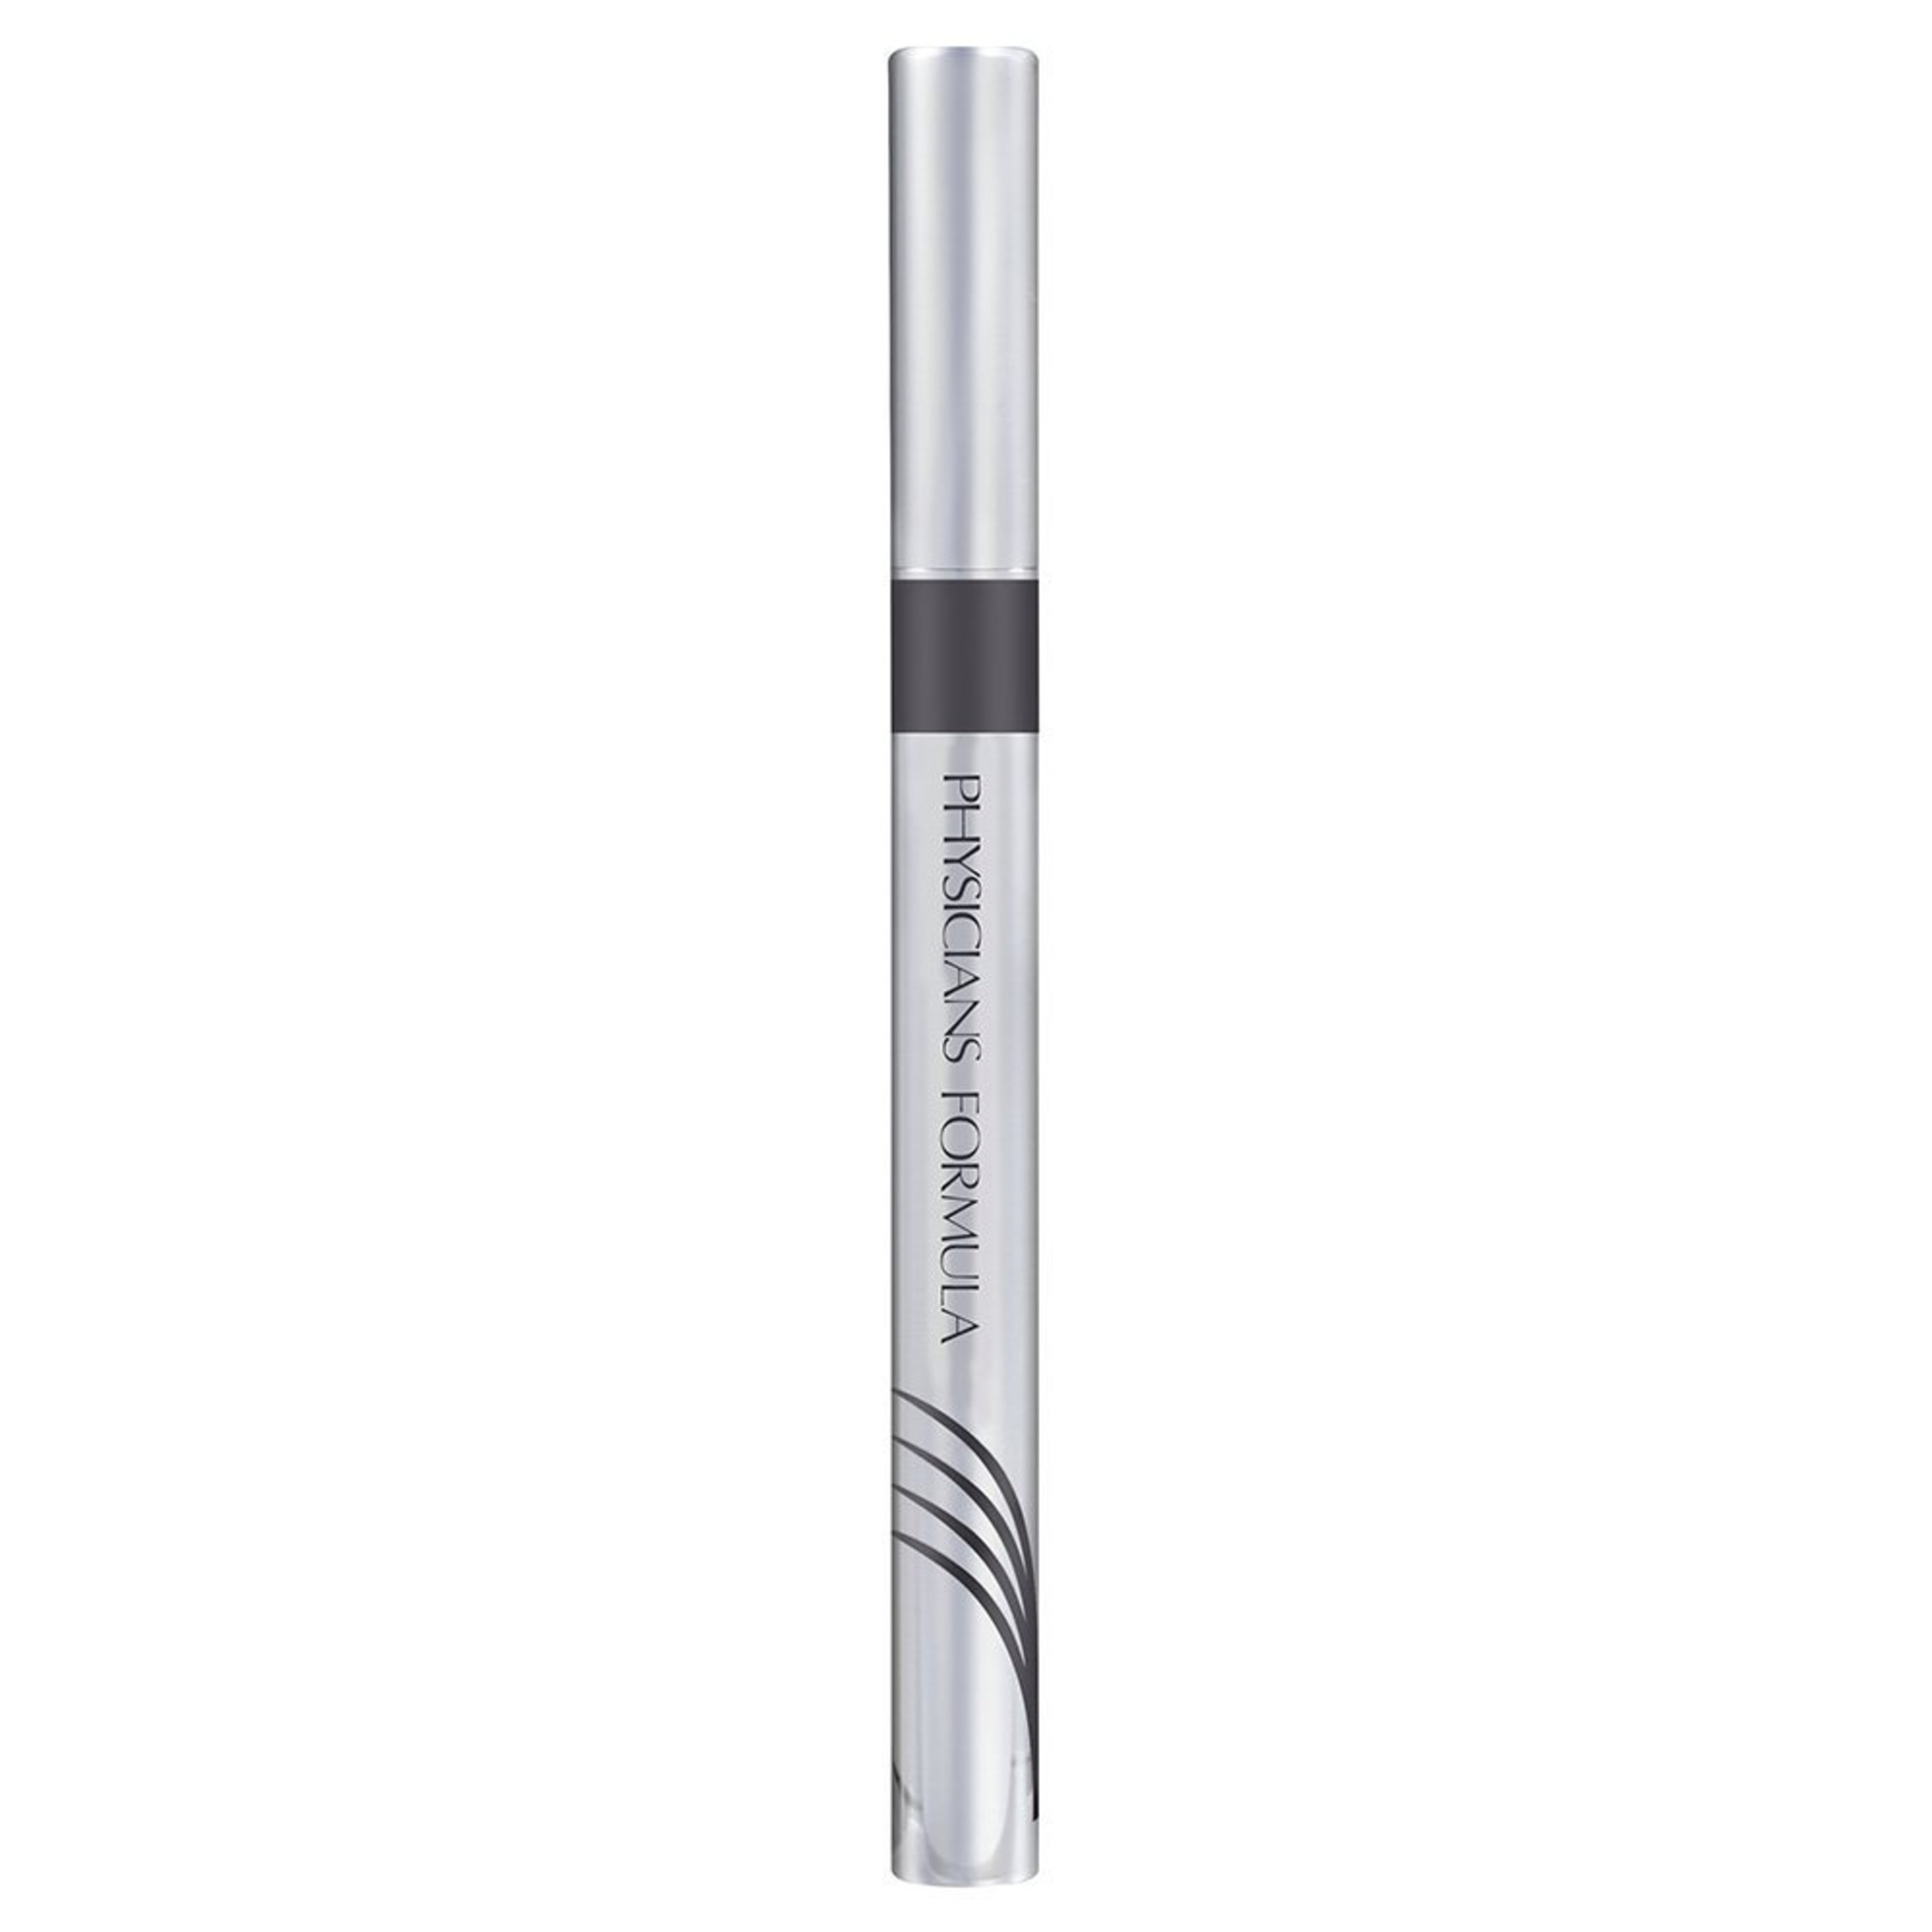 Physicians Formula Eye Booster™ Lash 2-in-1 Boosting Eyeliner & Serum - Black